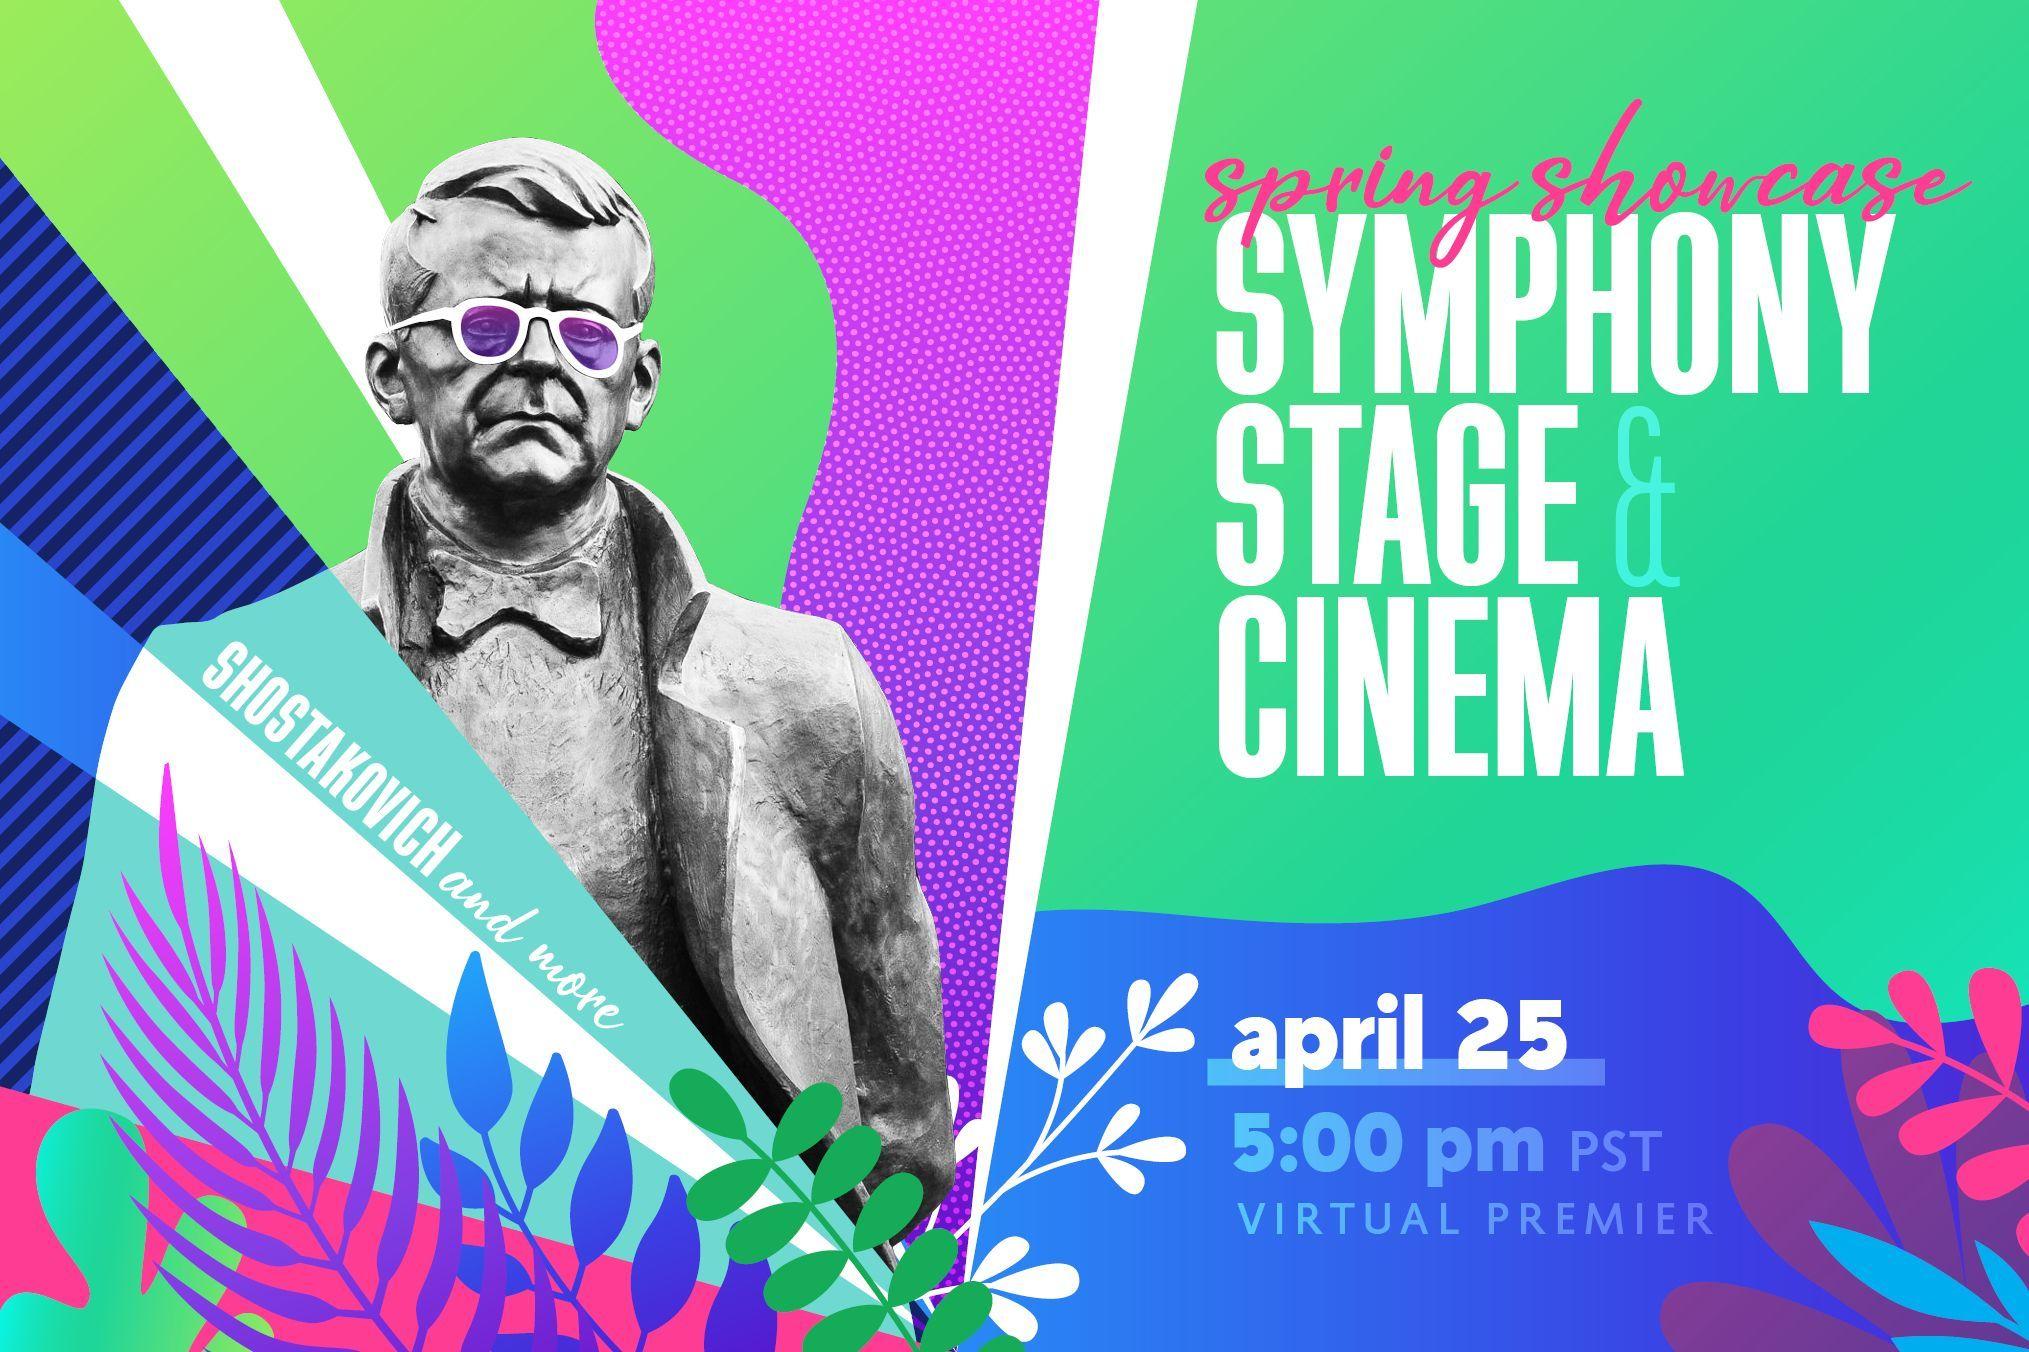 2021 Spring Showcase: Symphony, Stage & Cinema